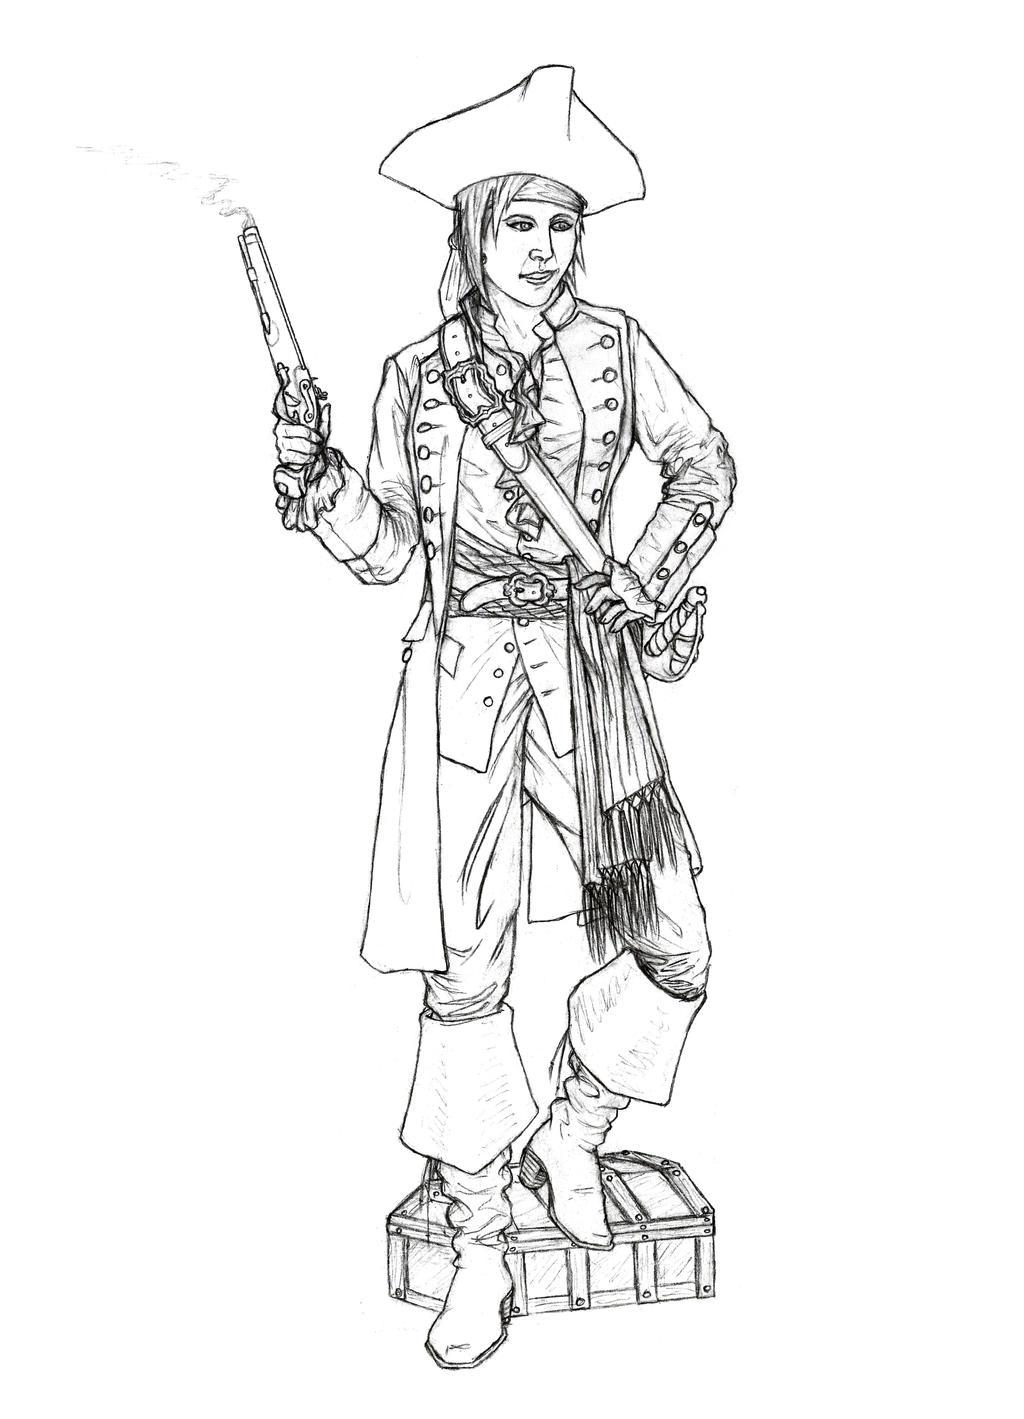 Sarah Rose Black, Pirate Queen by Manveruon